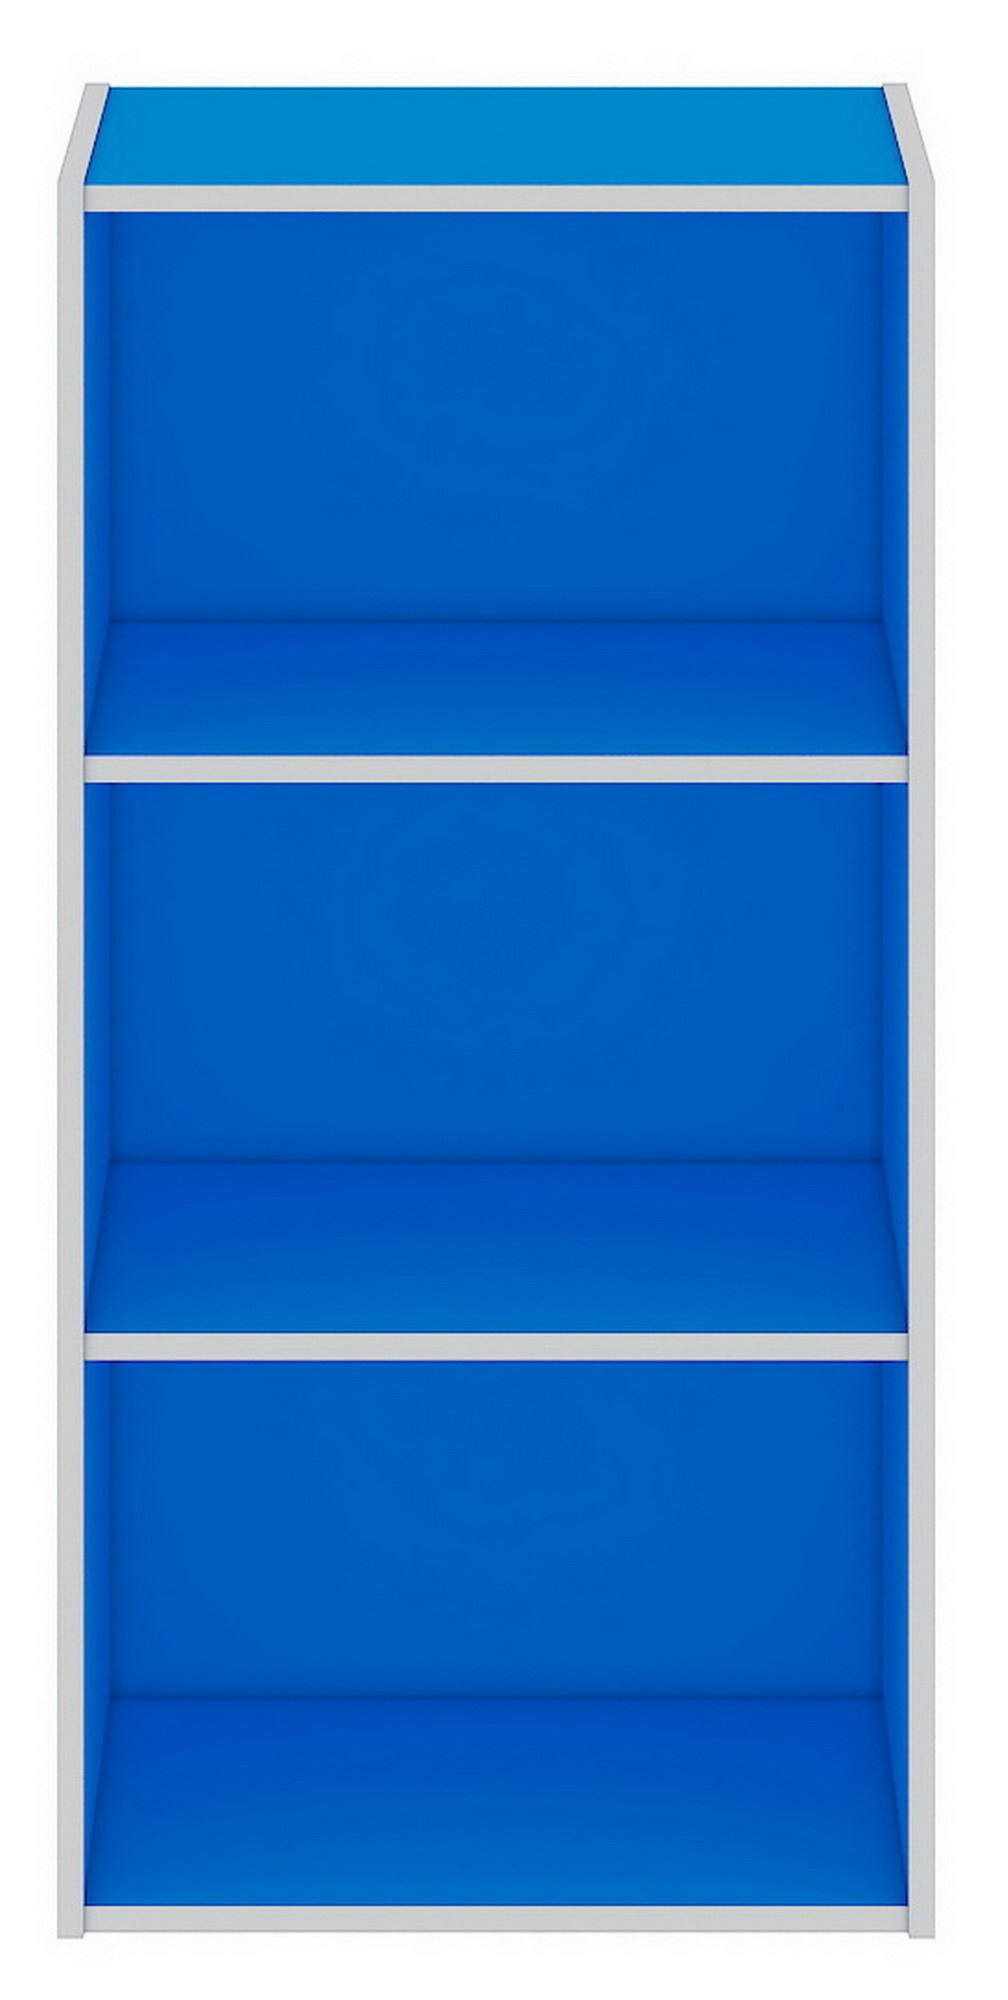 Herman Dexter Rak Buku - Pajangan - Econ Book Rack 3L - Biru Tua